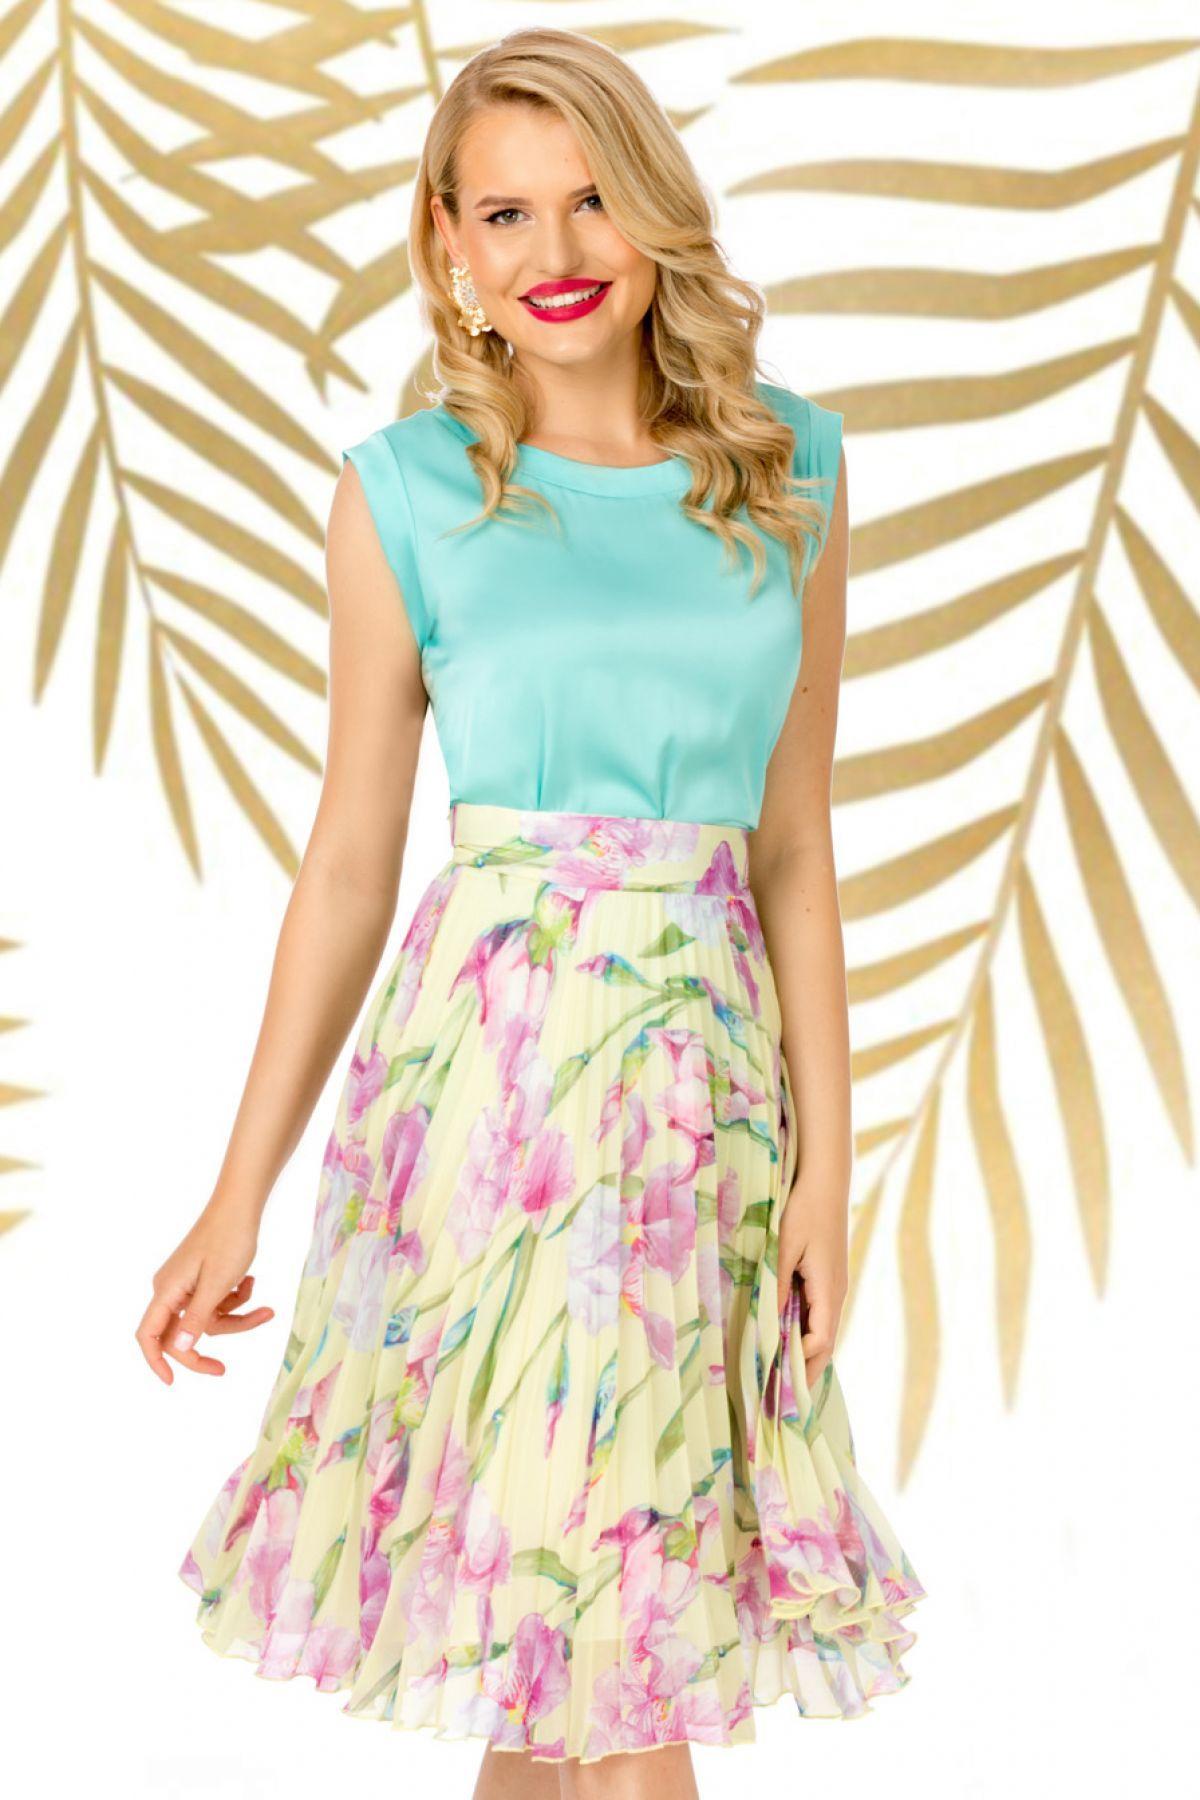 Fusta Pretty Girl plisata galben pal cu imprimeu floral